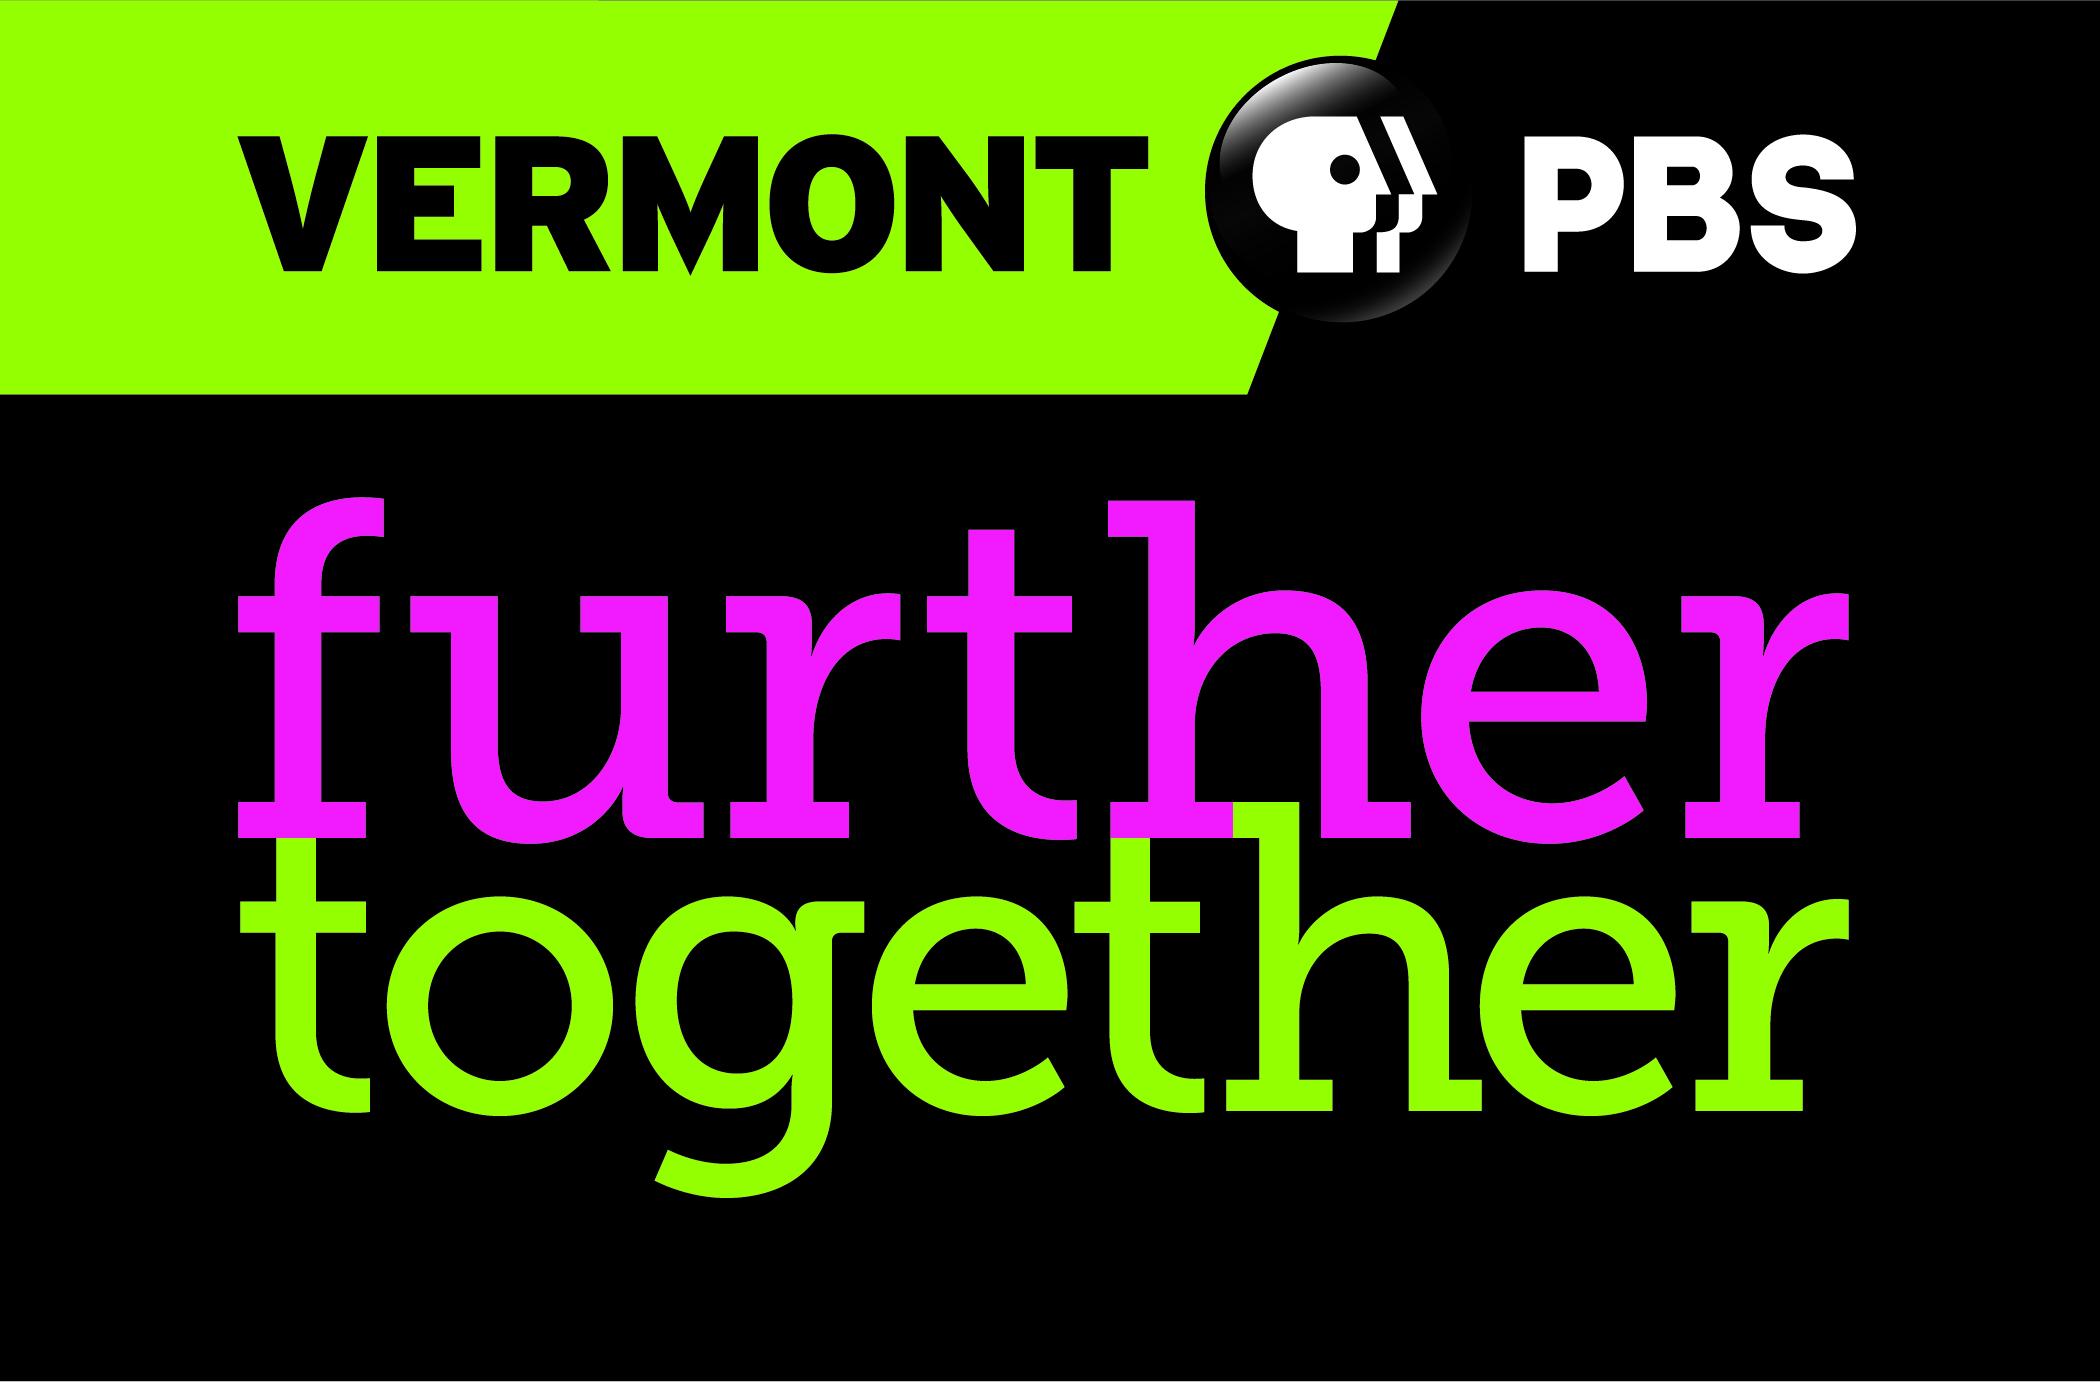 VT PBS Logo